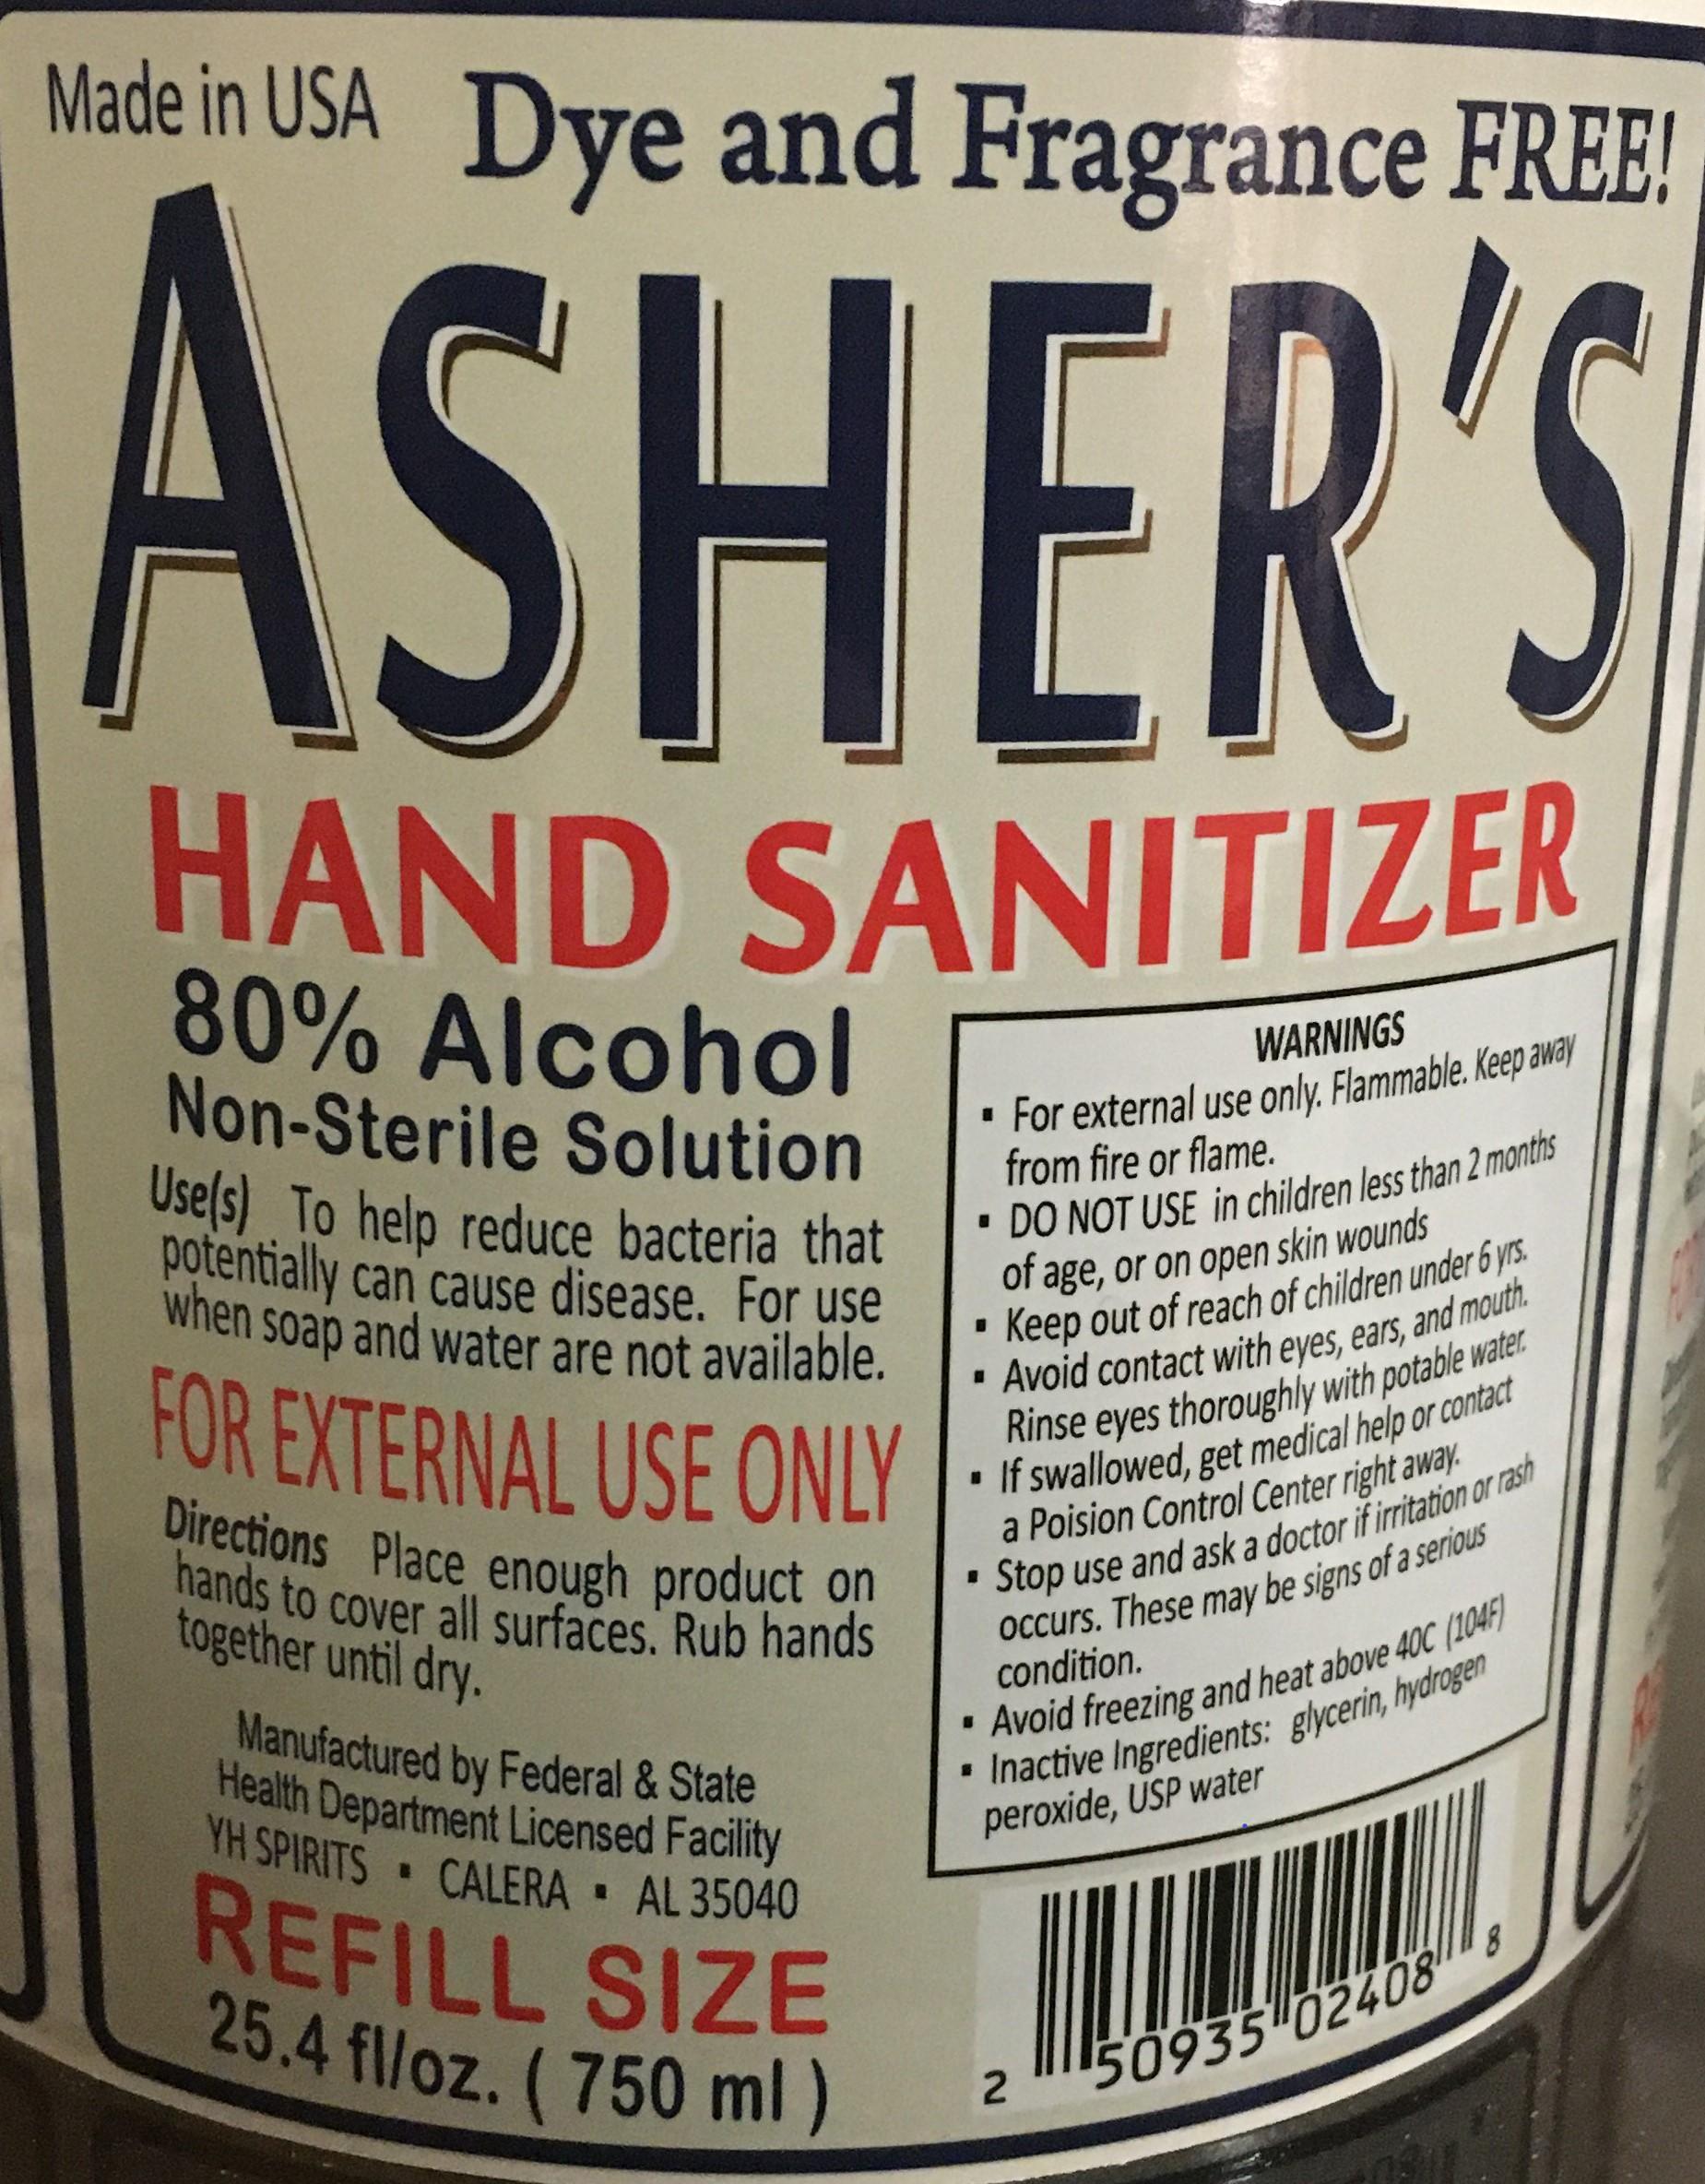 Asher's Bottle Label